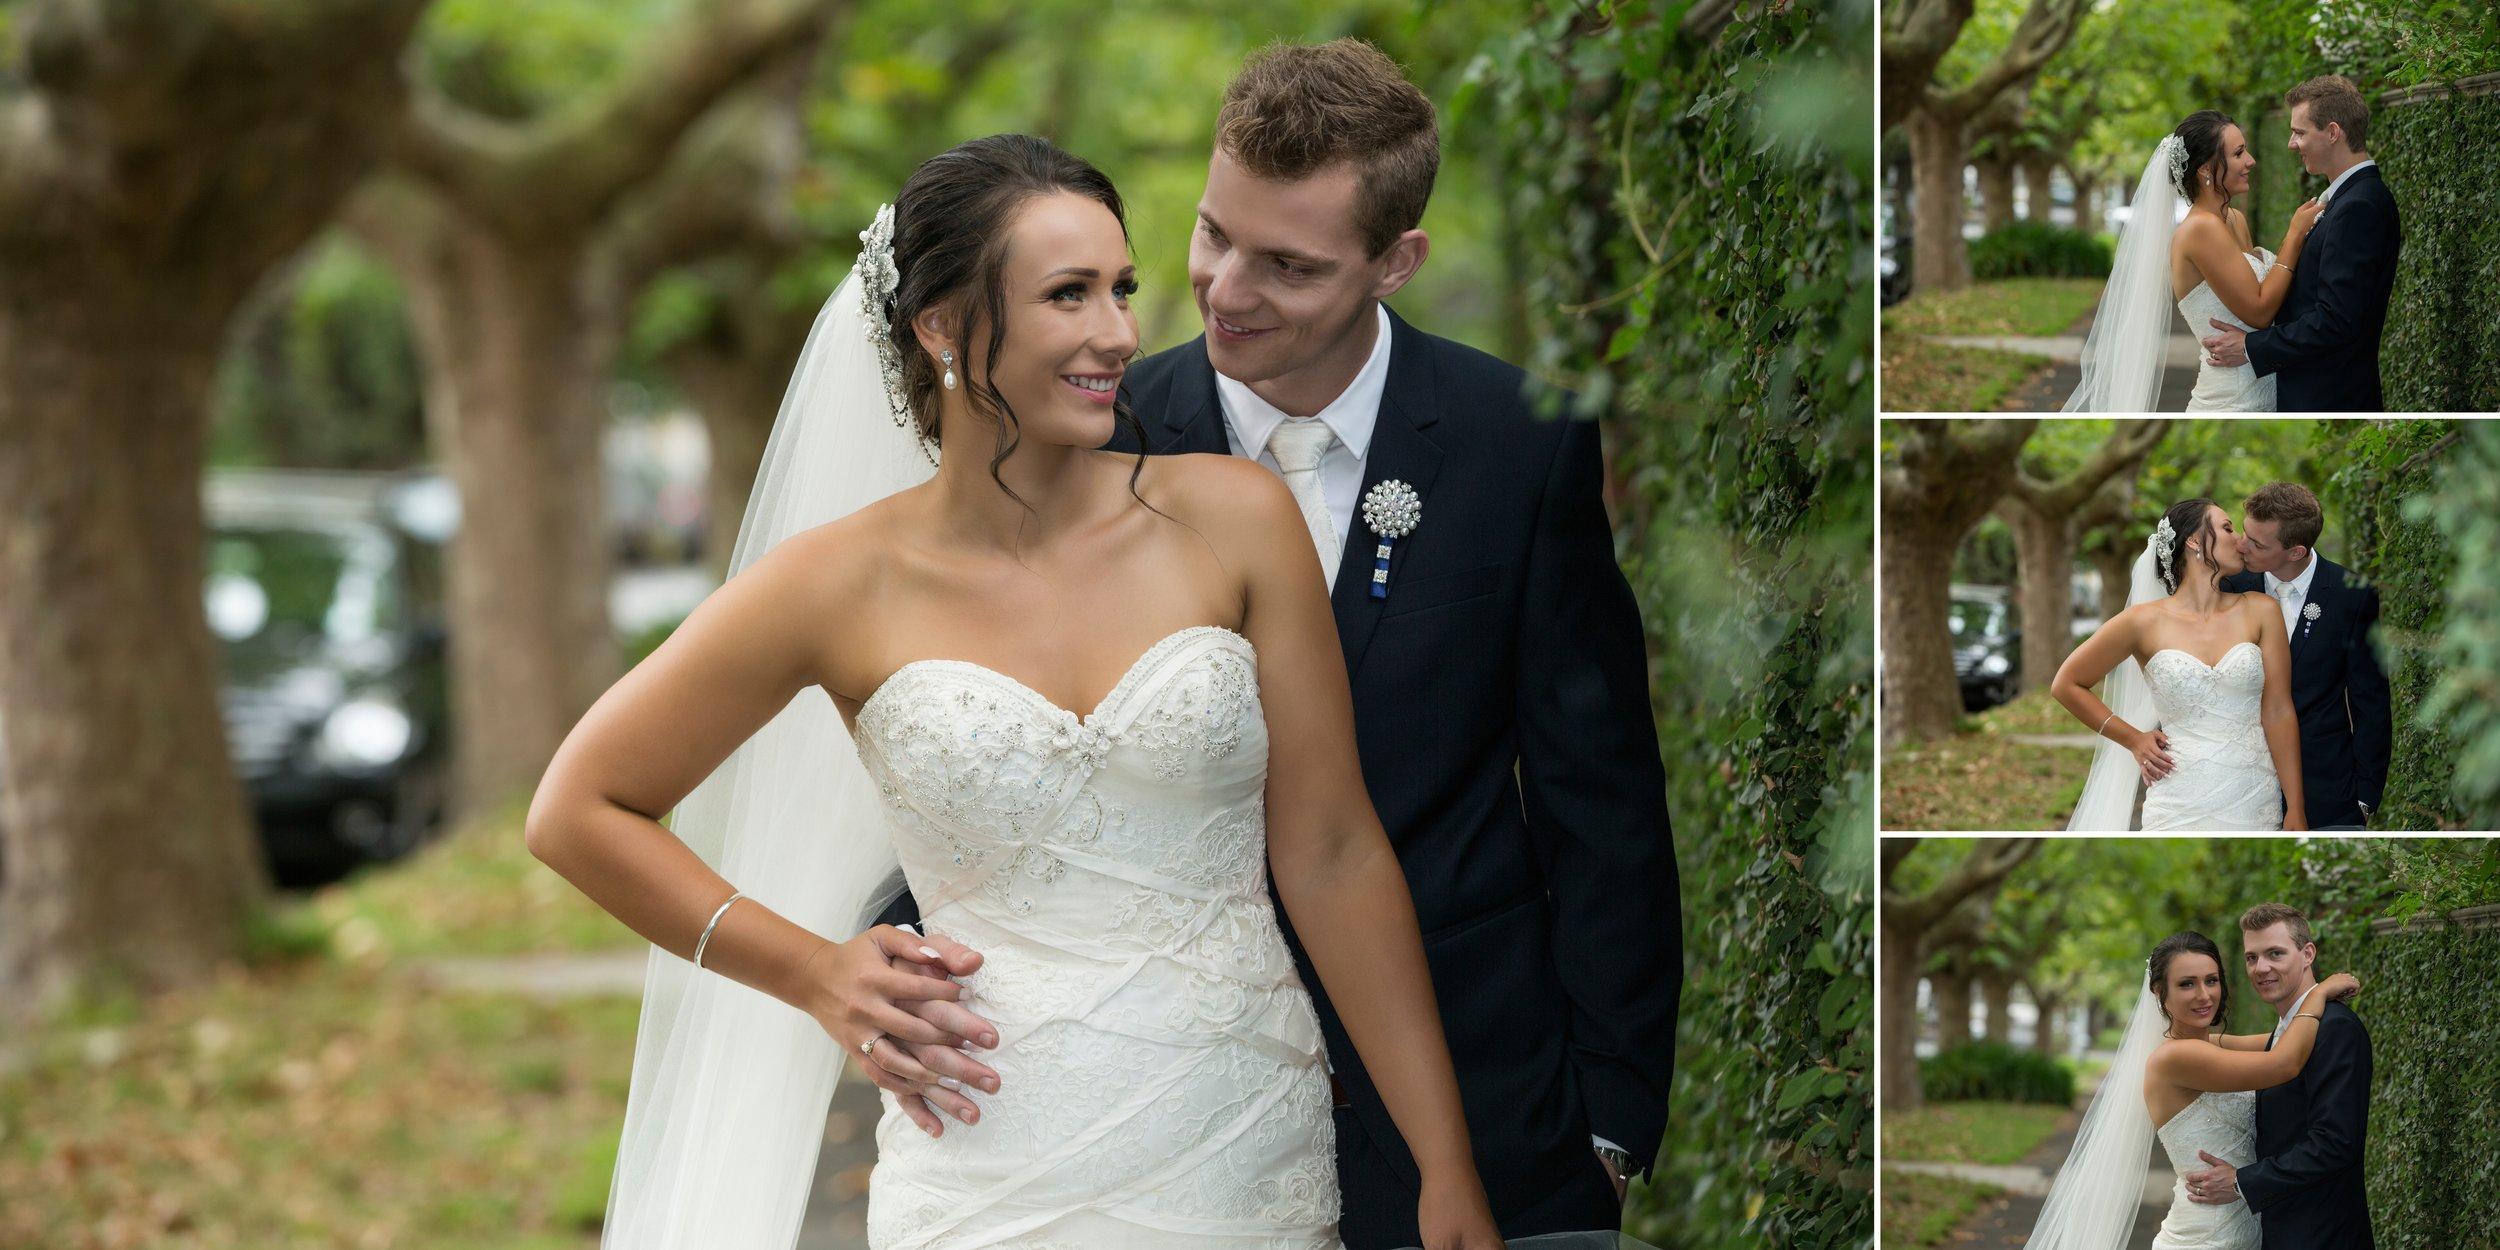 Melbourne Wedding Photographer, Yarra Valley Wedding Photographer, Echuca Wedding Photographer, Bendigo Wedding Photographer